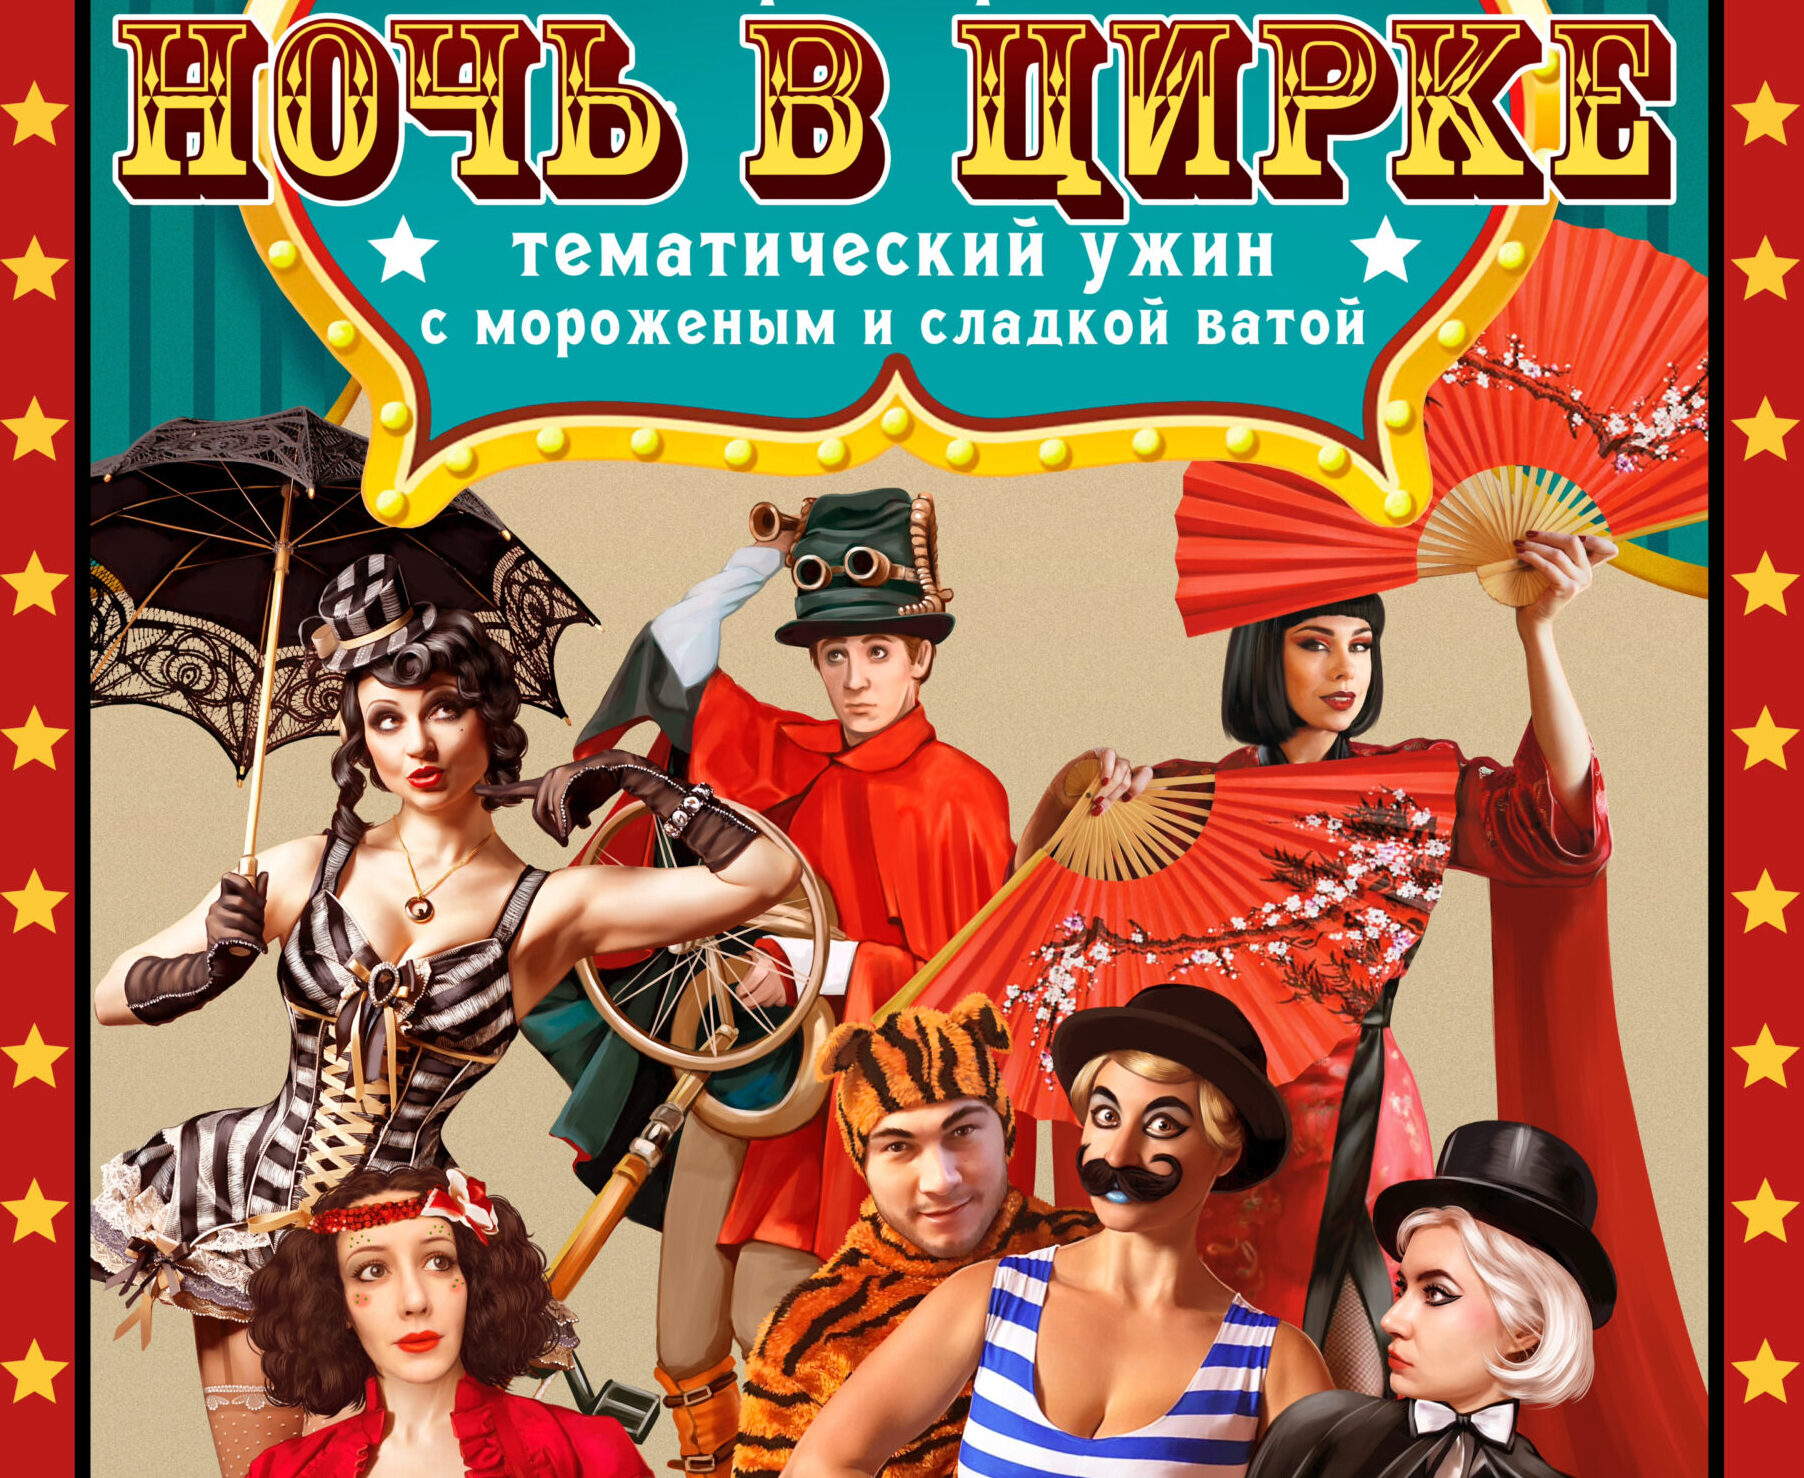 Афиша! Бурлеск-кабаре с оркестром «Ночь в Цирке» 30 января в Embers Speakeasy